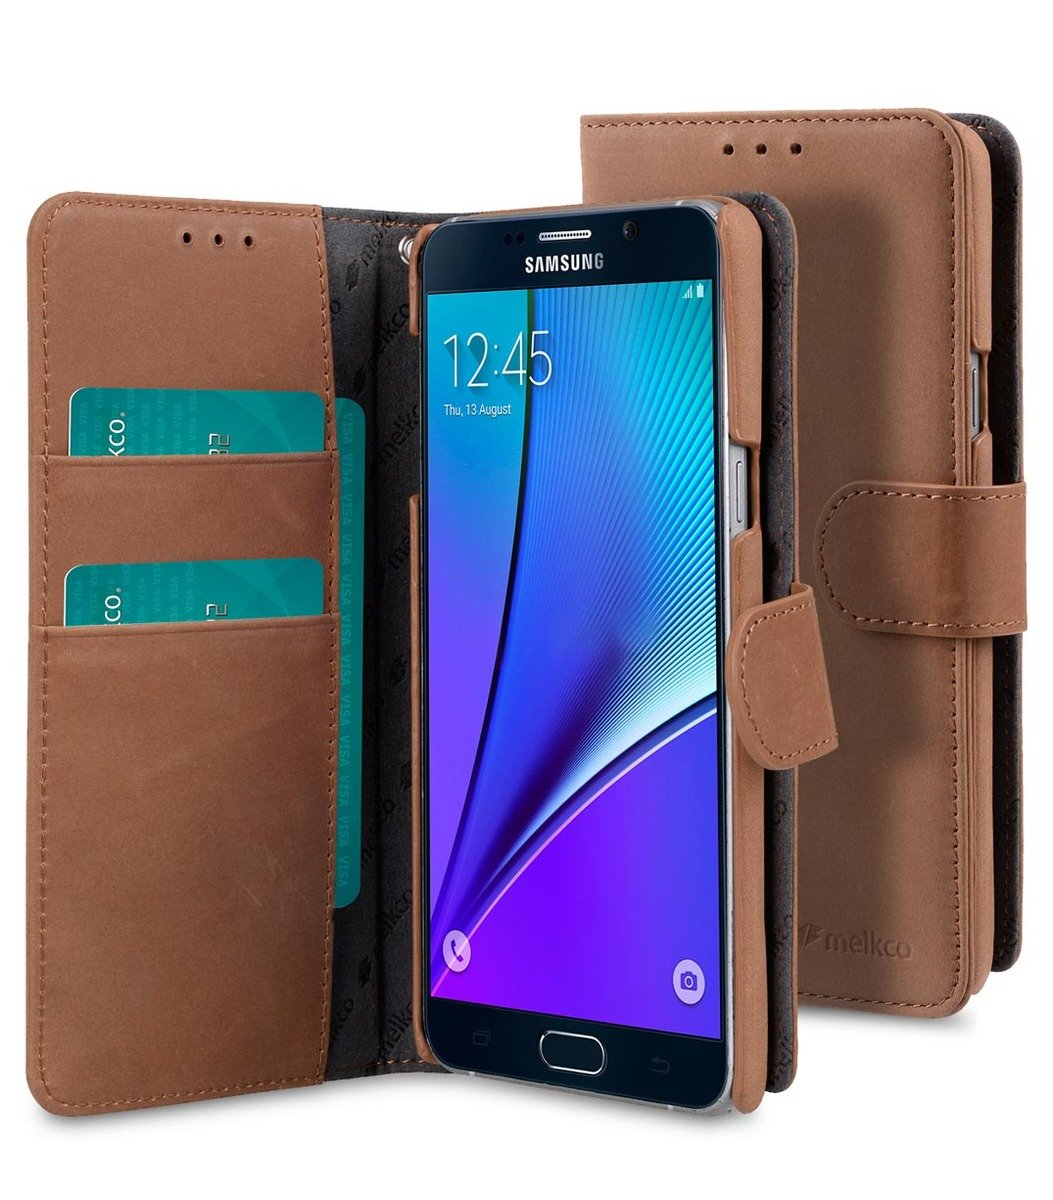 Samsung Galaxy Note 5 Wallet Book Type 高級真皮革手機套 - 磨沙啡色